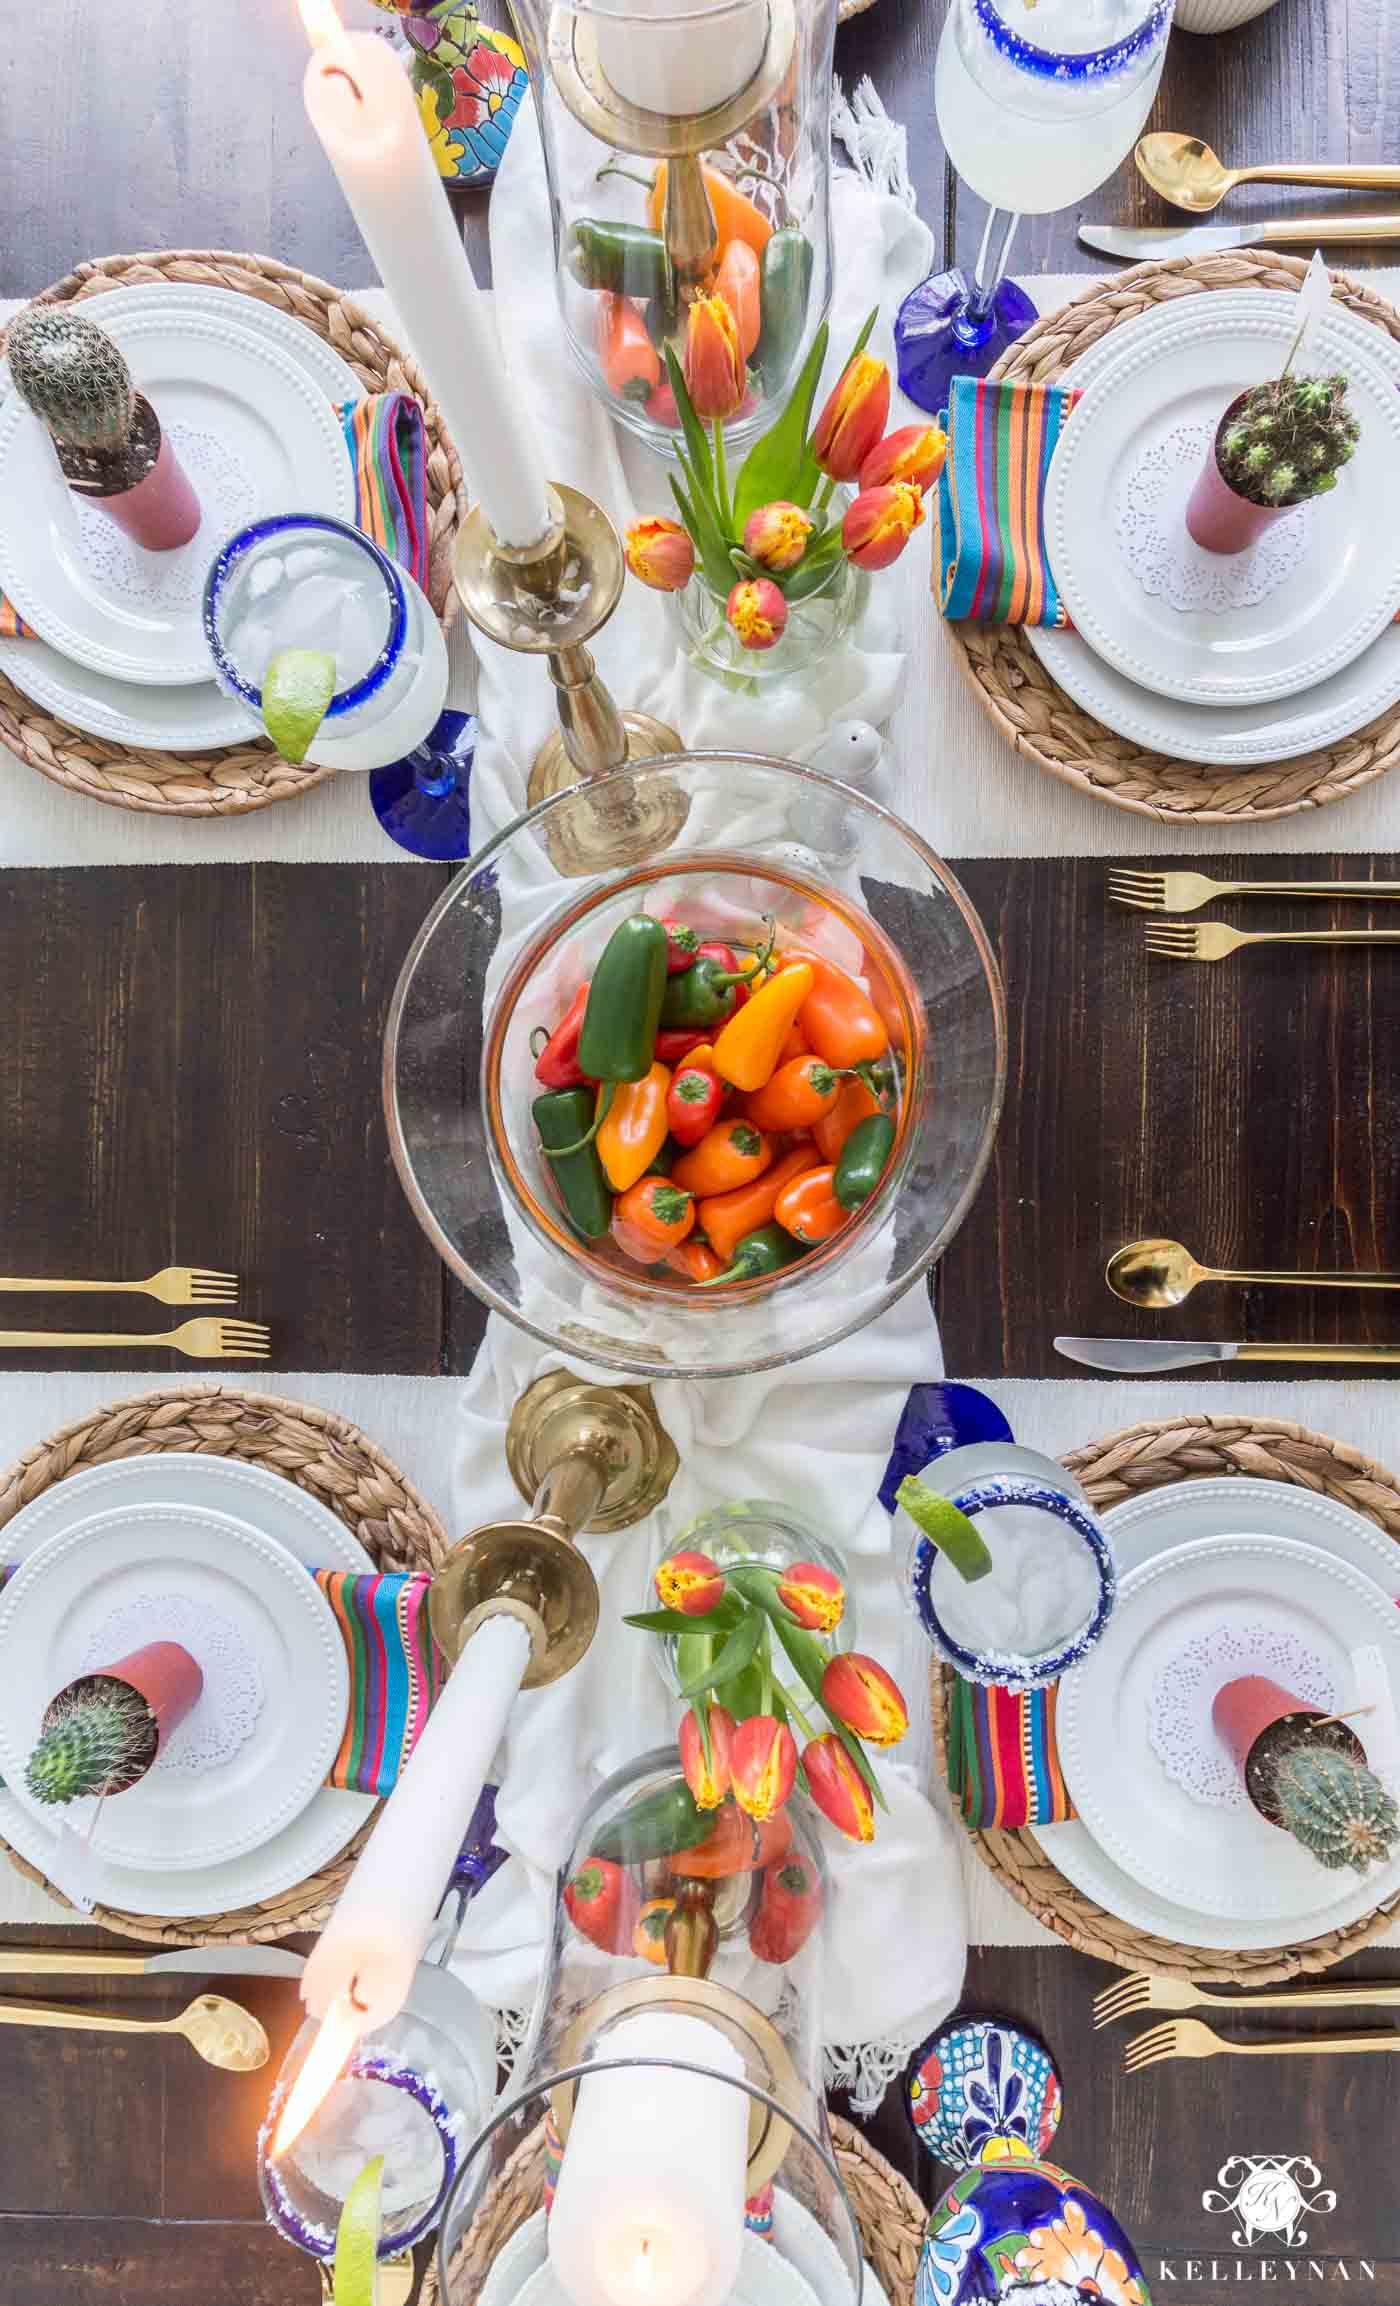 Pepper Centerpiece for Cinco de Mayo Table